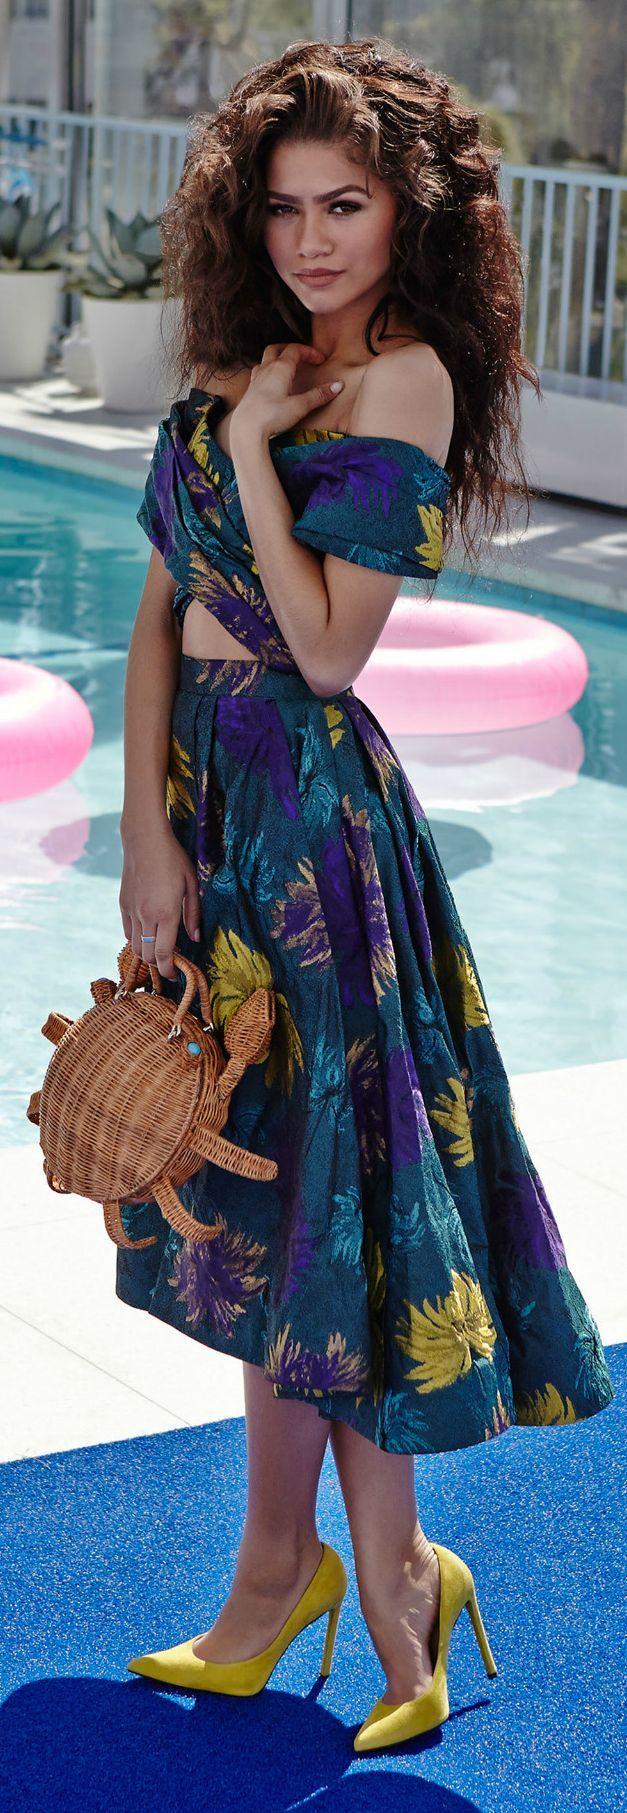 Floral summer dress (lolobu)